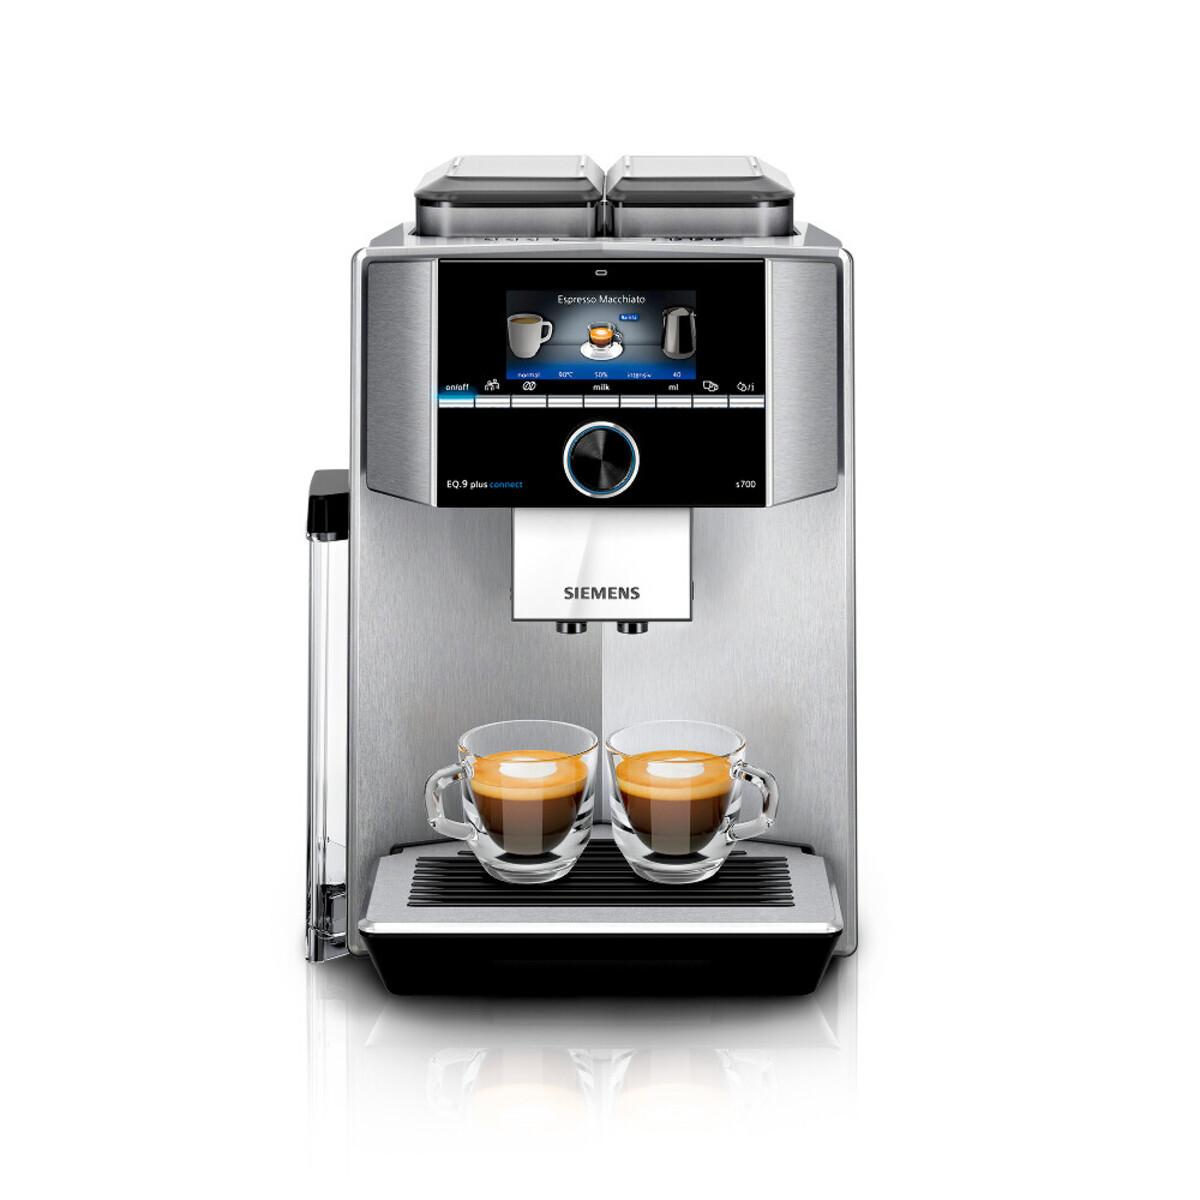 Bild 1 von SIEMENS EQ.9 plus connect s700 TI9578X1DE Edelstahl Kaffeevollautomat